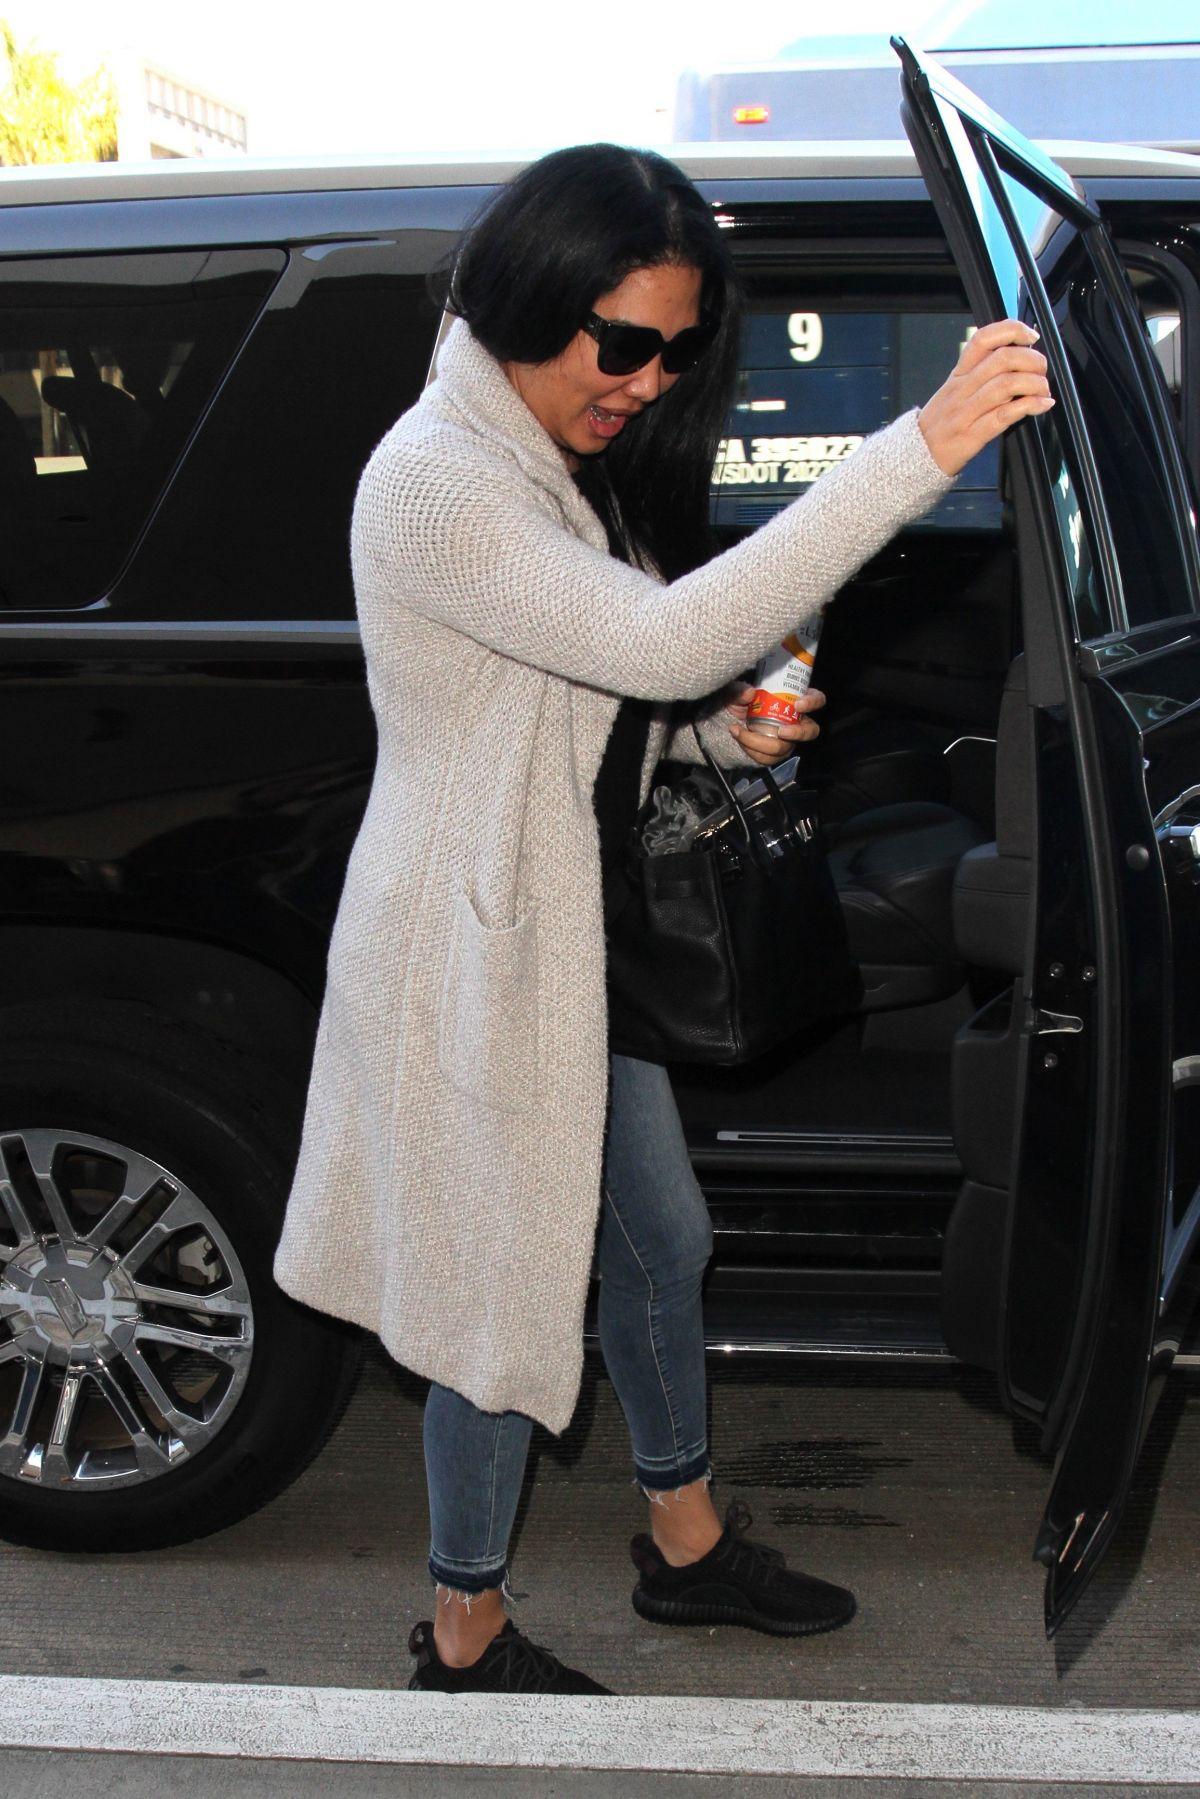 KIMORA LEE SIMMONS at LAX Airport in Los Angeles 03/09/2017